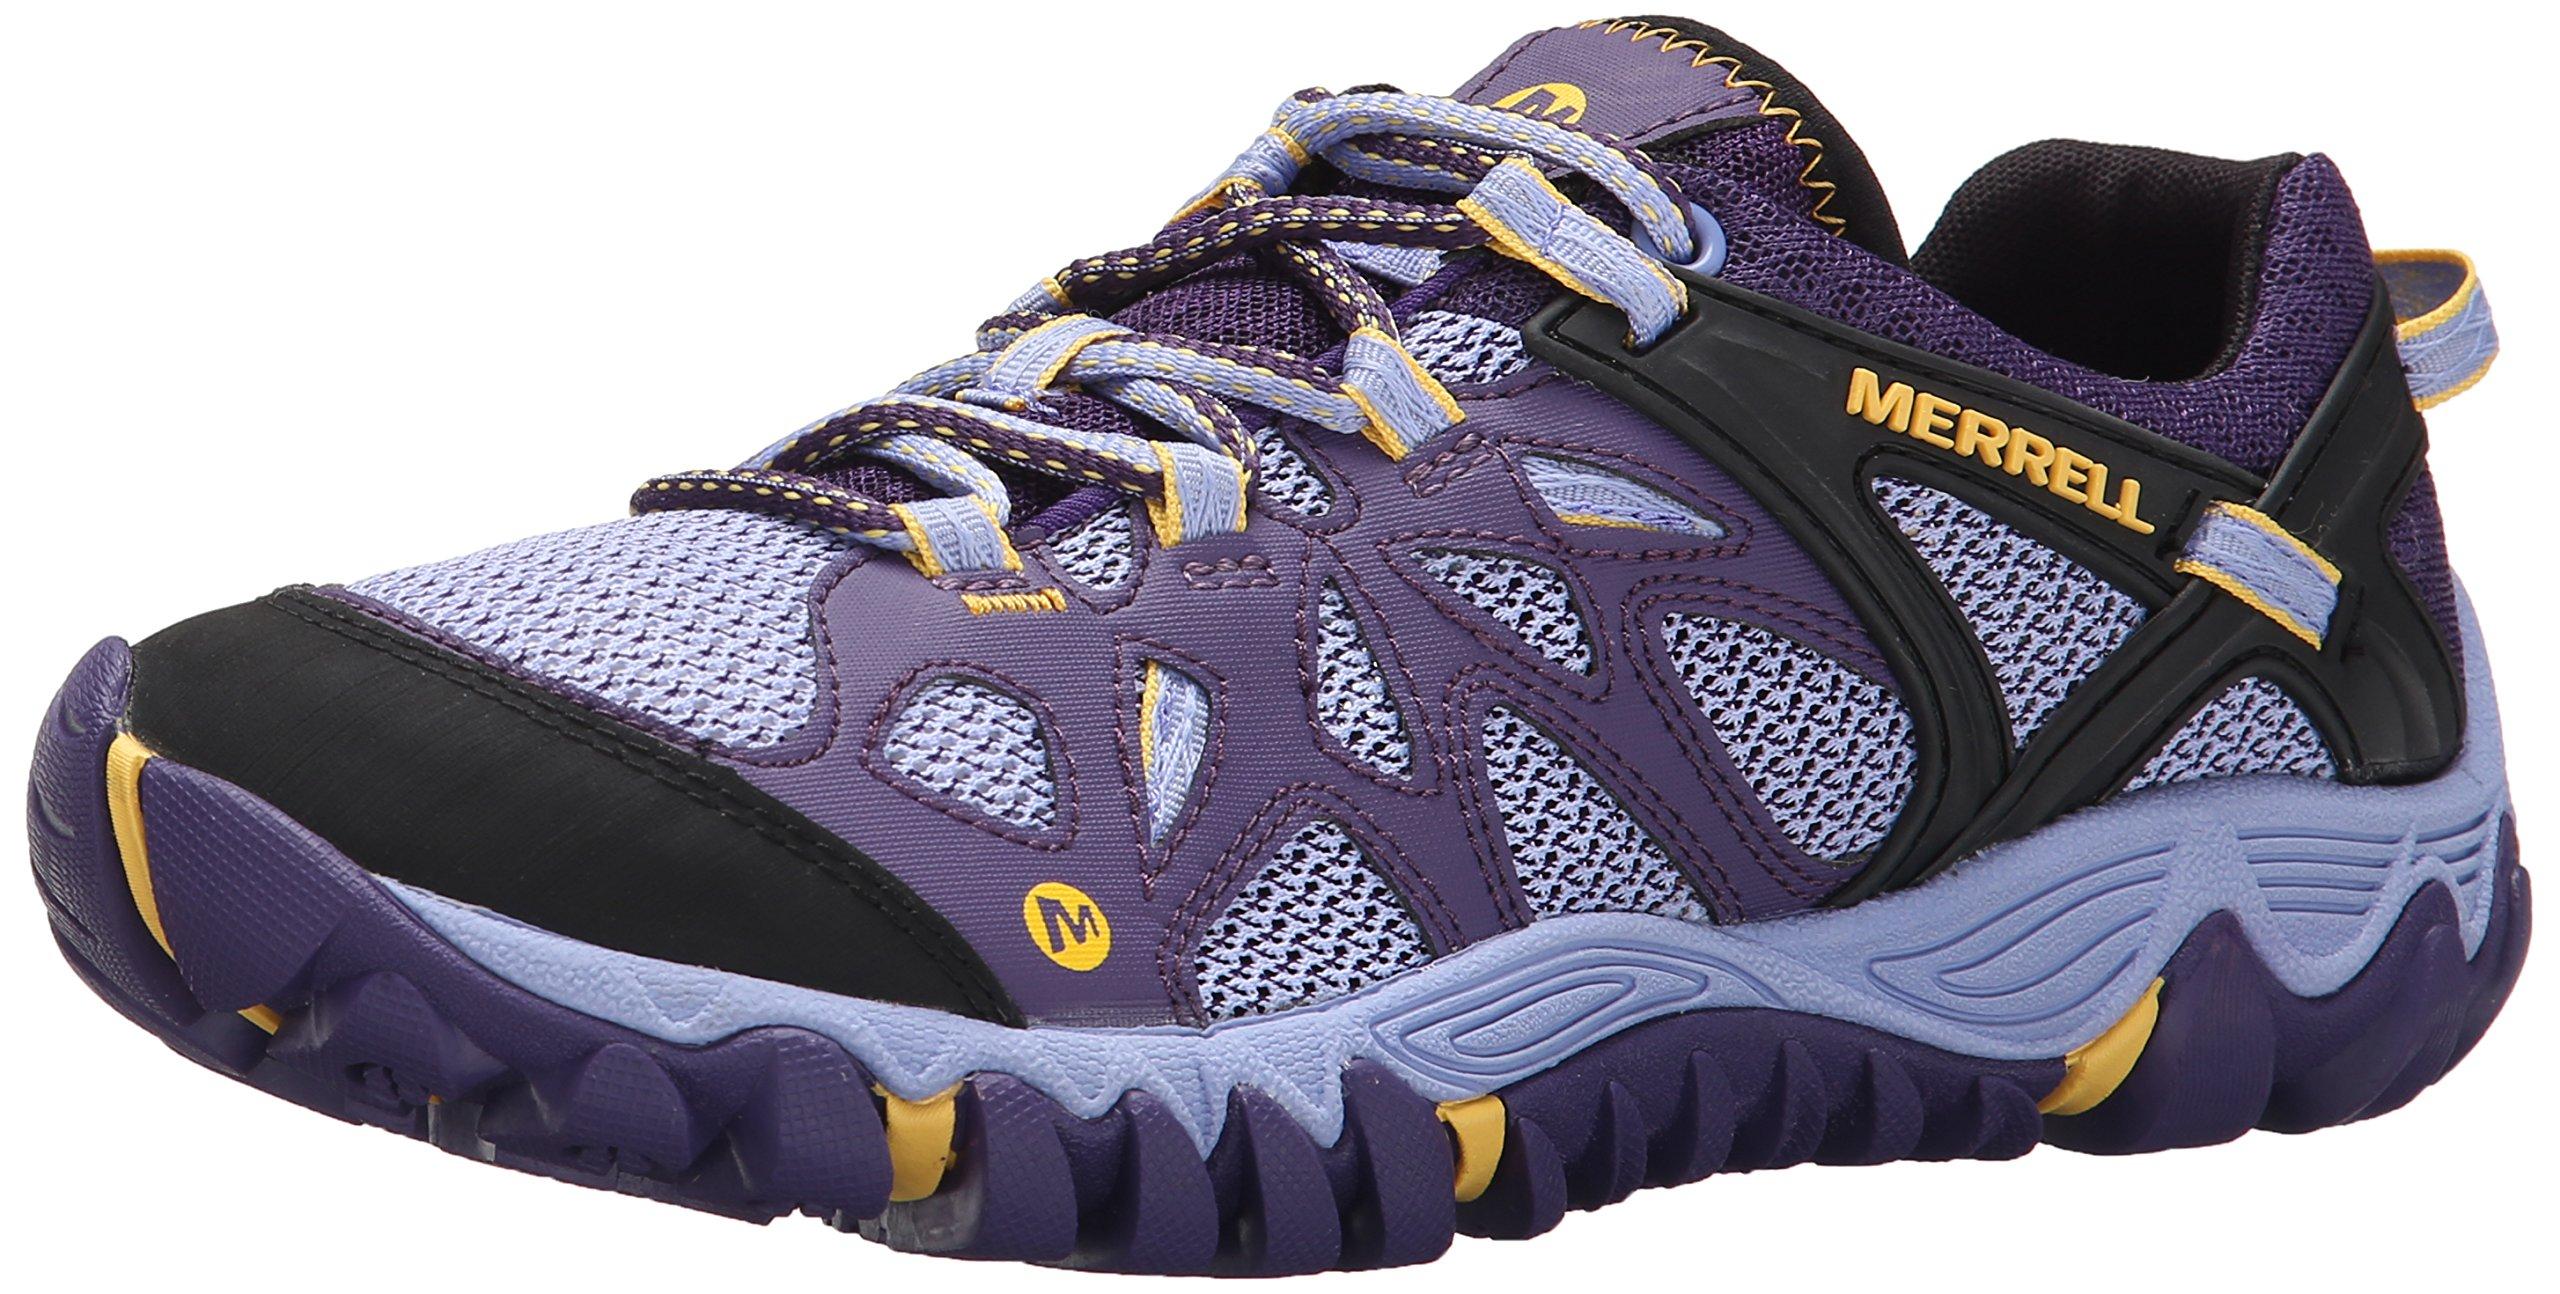 Merrell Women's All Out Blaze Aero Sport Hiking Water Shoe,Parachute Purple,8 M US